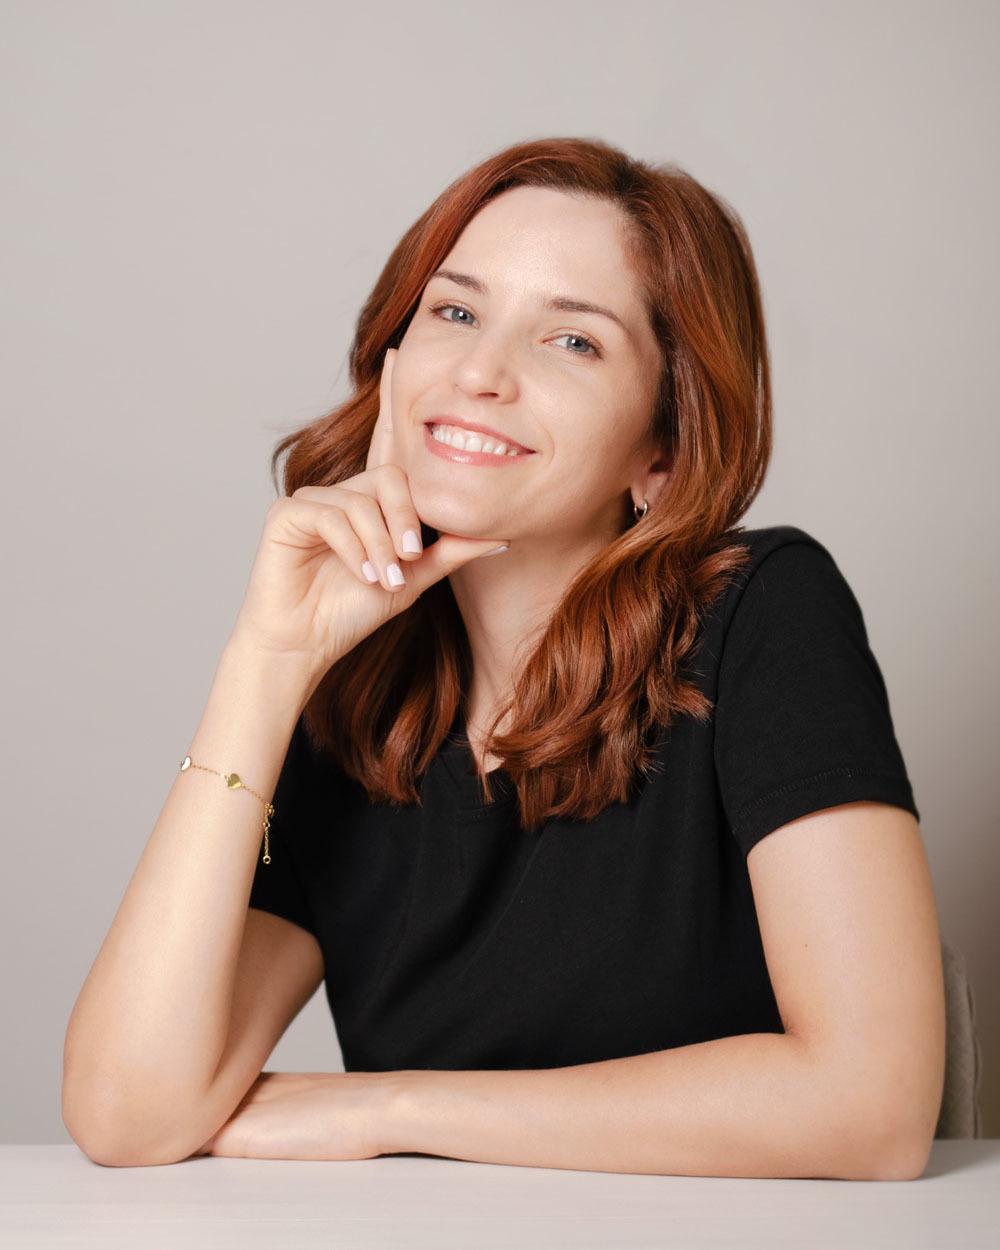 Doctora Candy Hernández, experta en medicina estética.